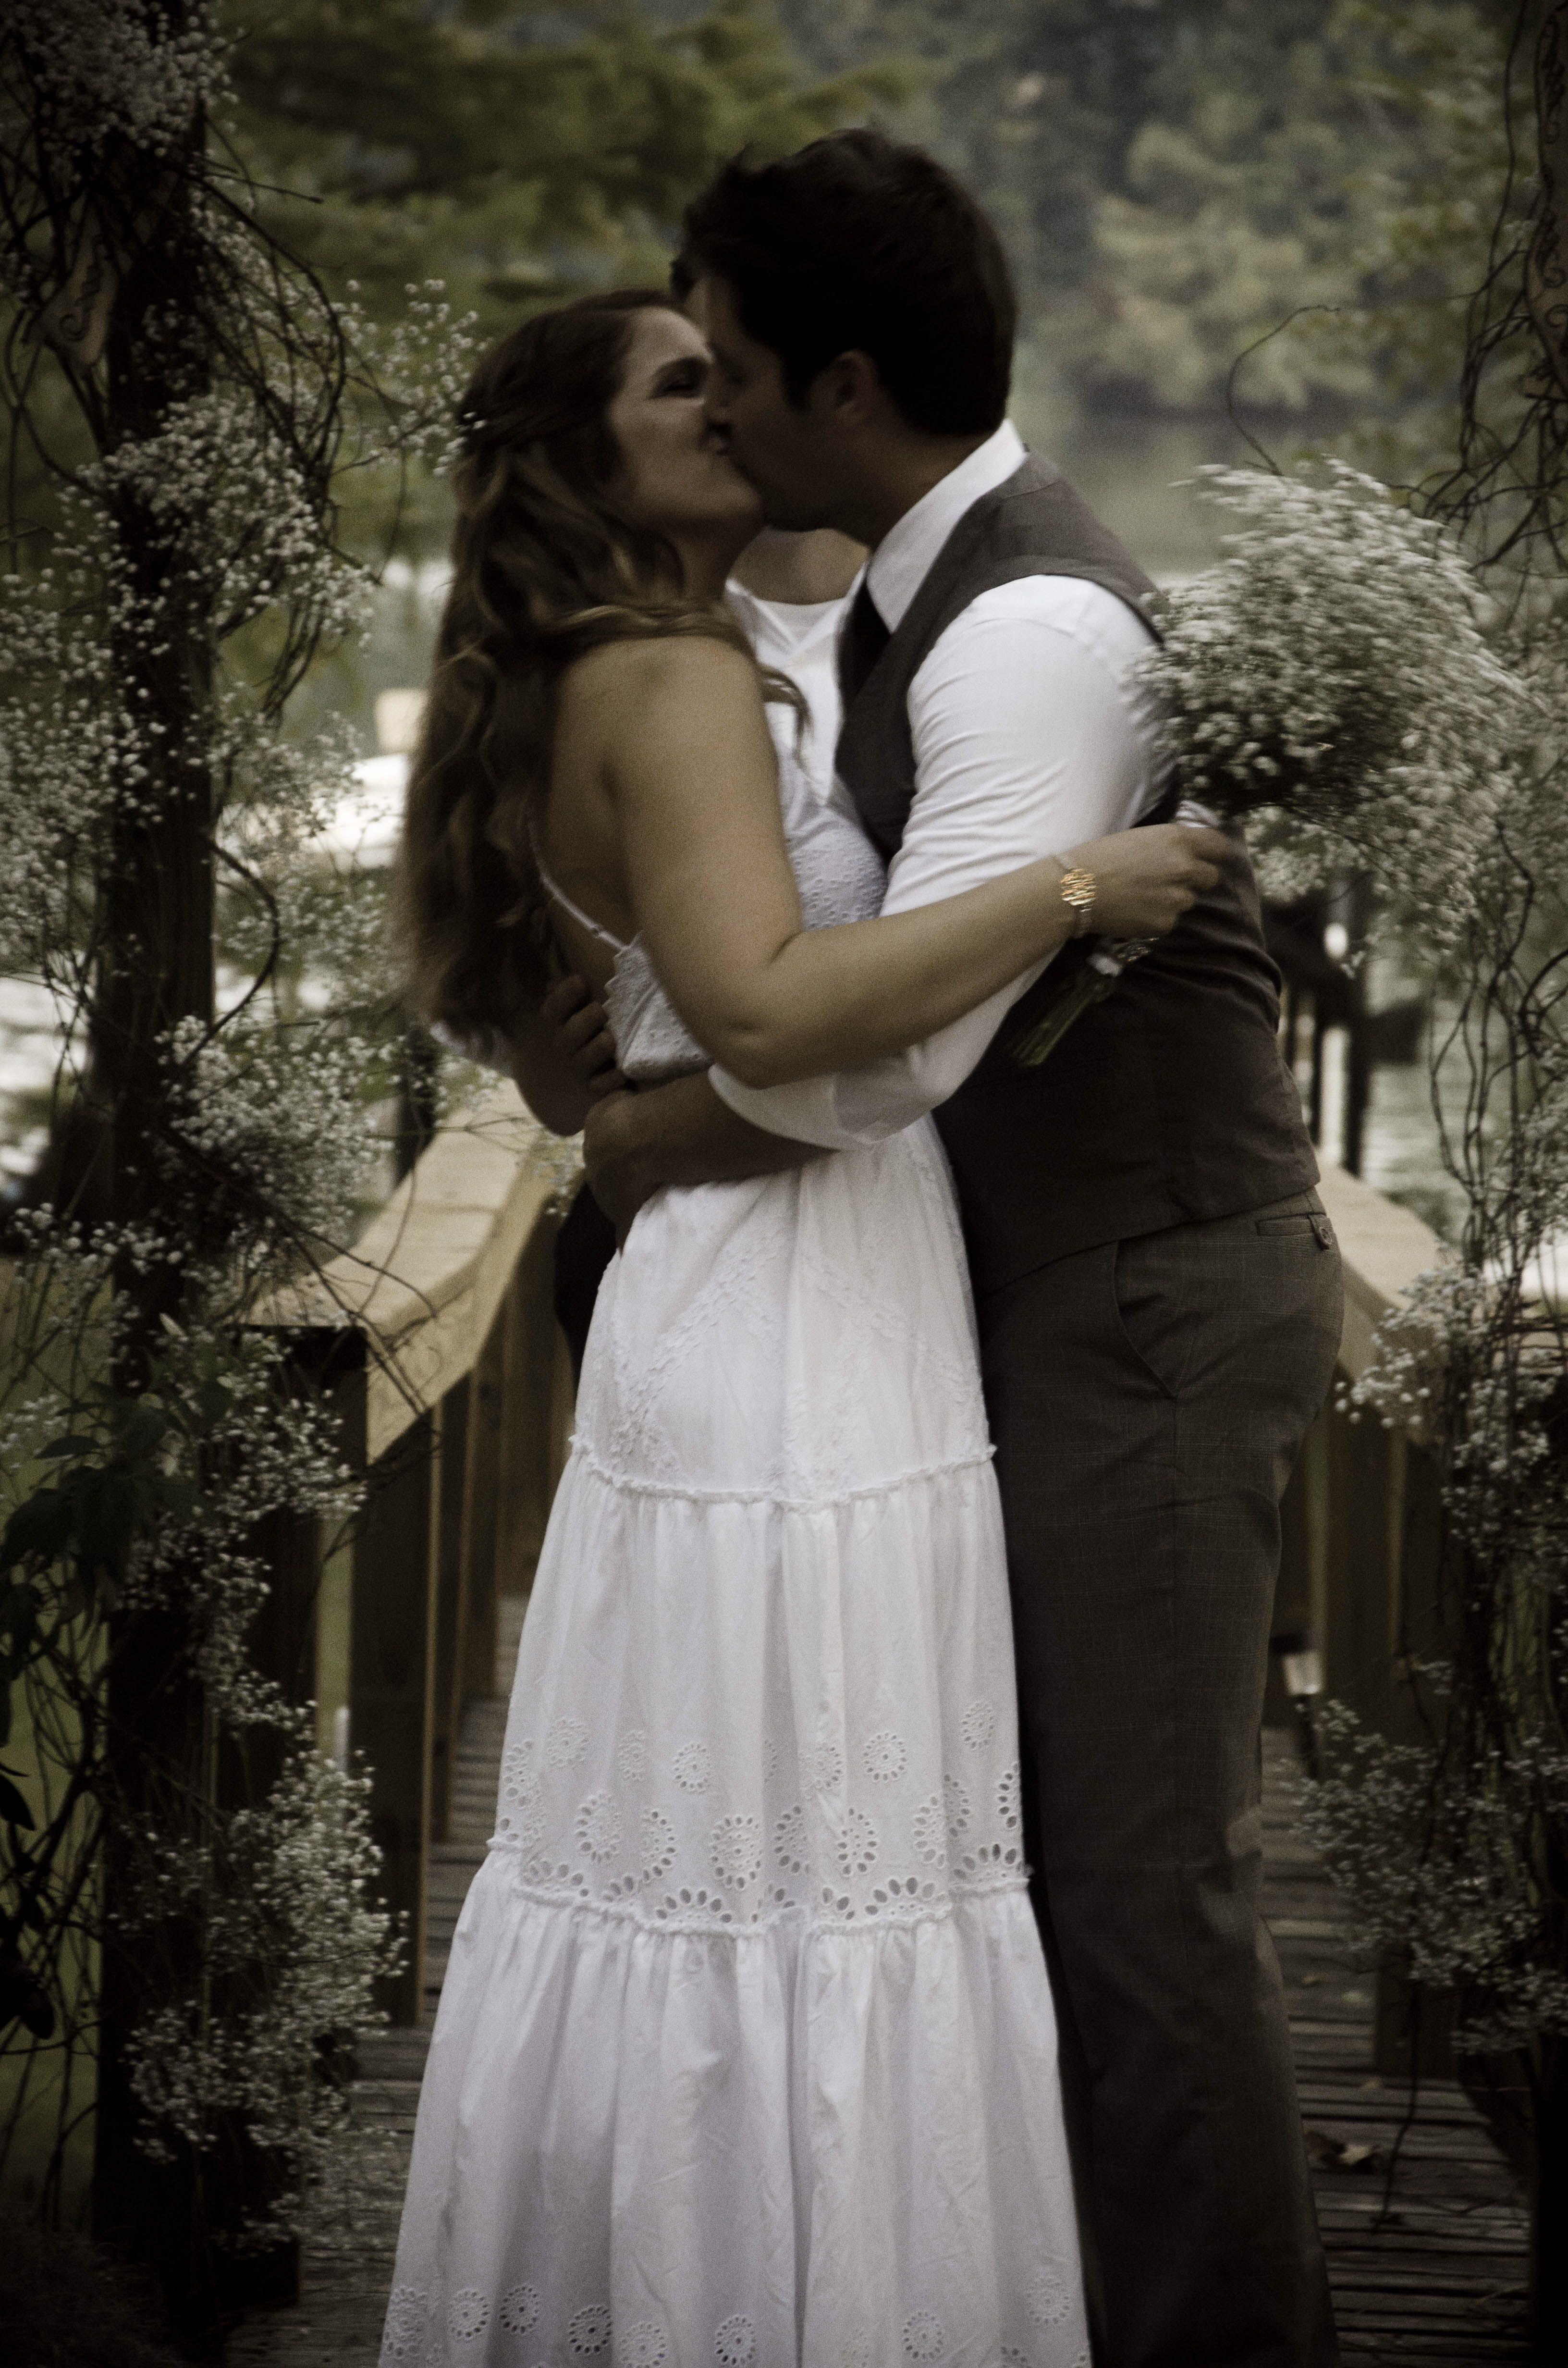 Rustic lake wedding decor. Casual bride and groom. Shabby